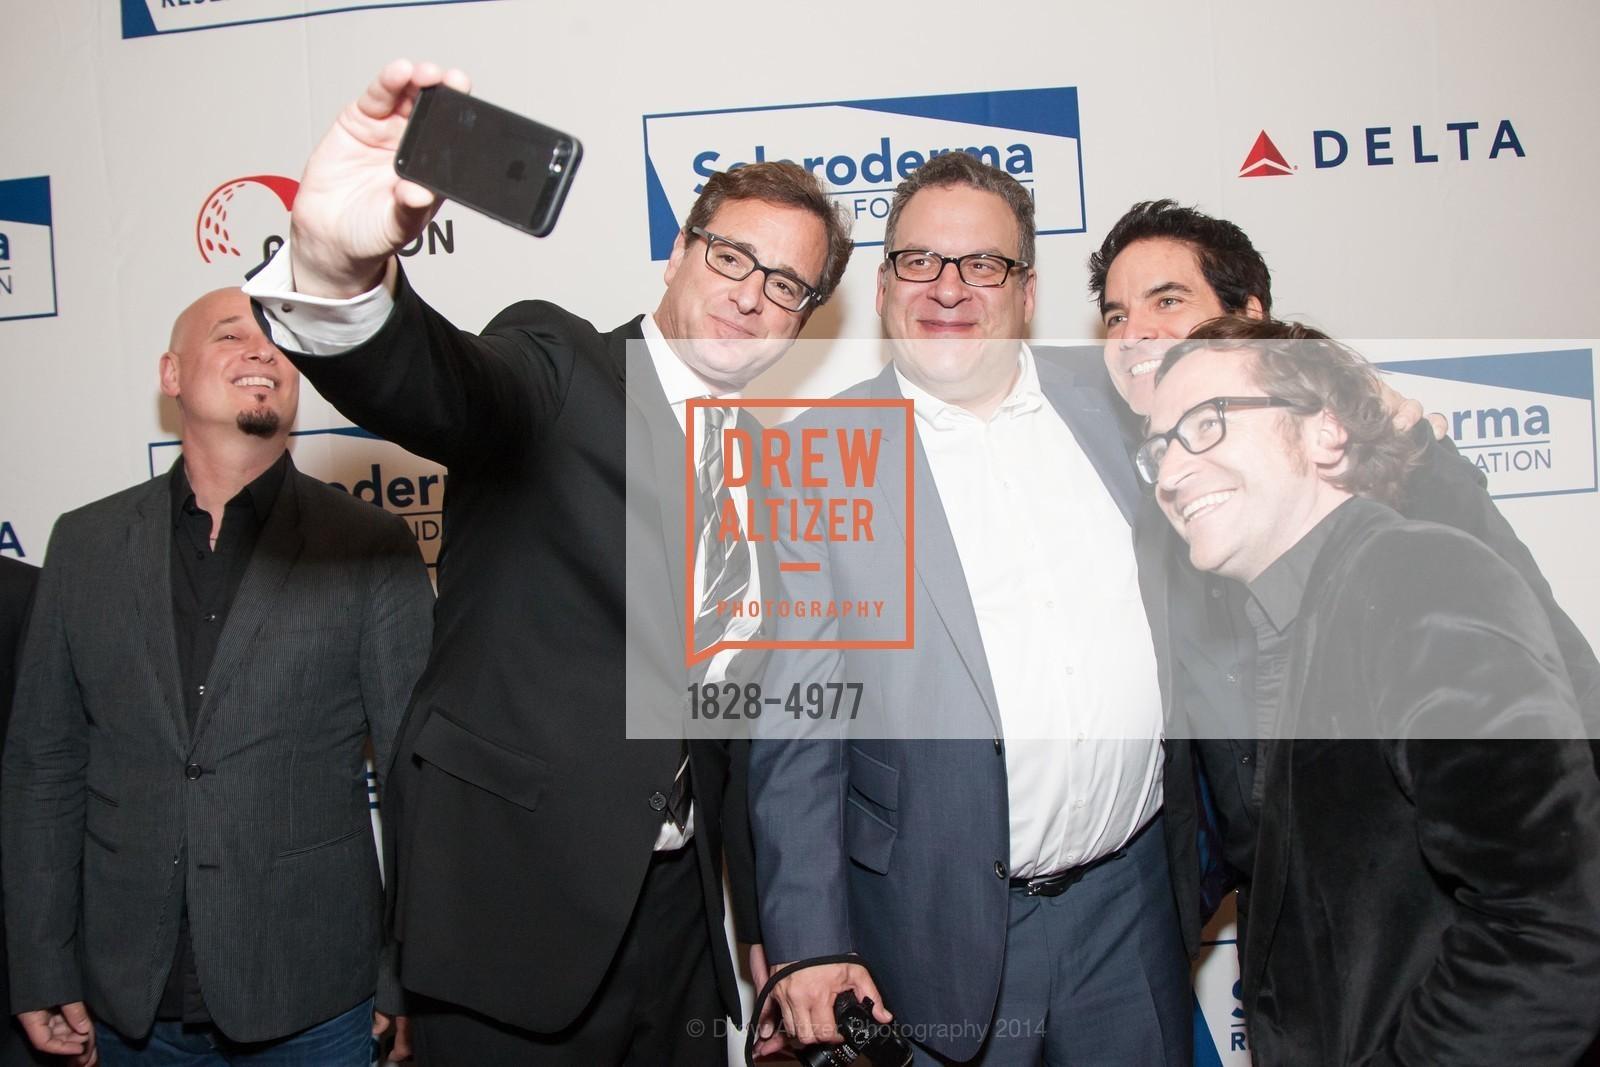 Jimmy Stafford, Bob Saget, Jeff Garlin, Pat Monahan, Jerry Becker, Photo #1828-4977